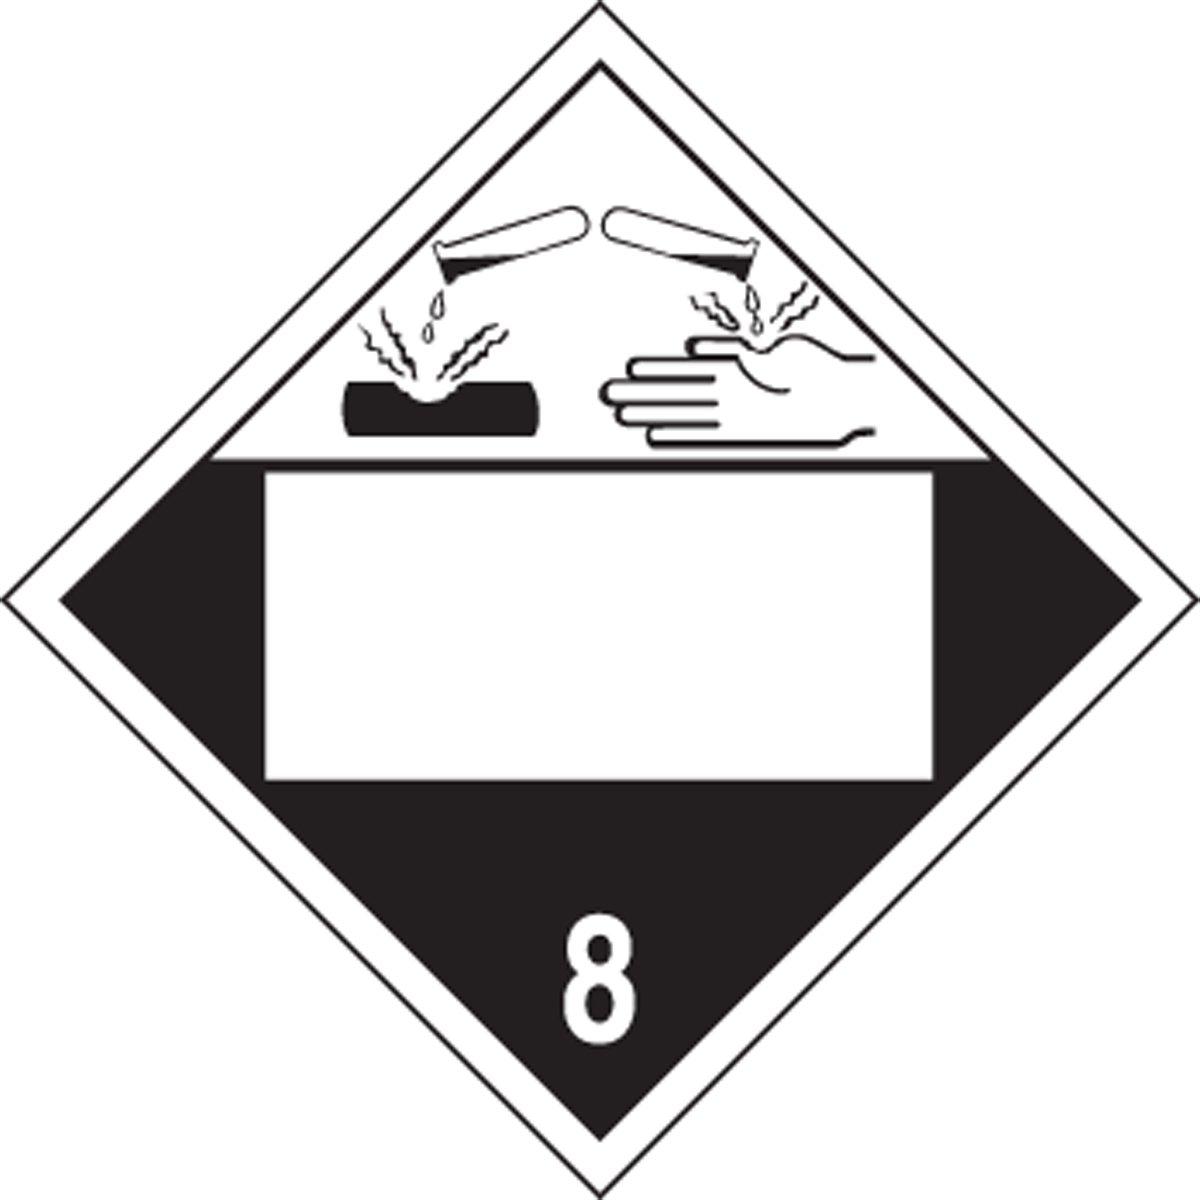 Placard - Class 8 - Corrosive - Editable (50/pack)